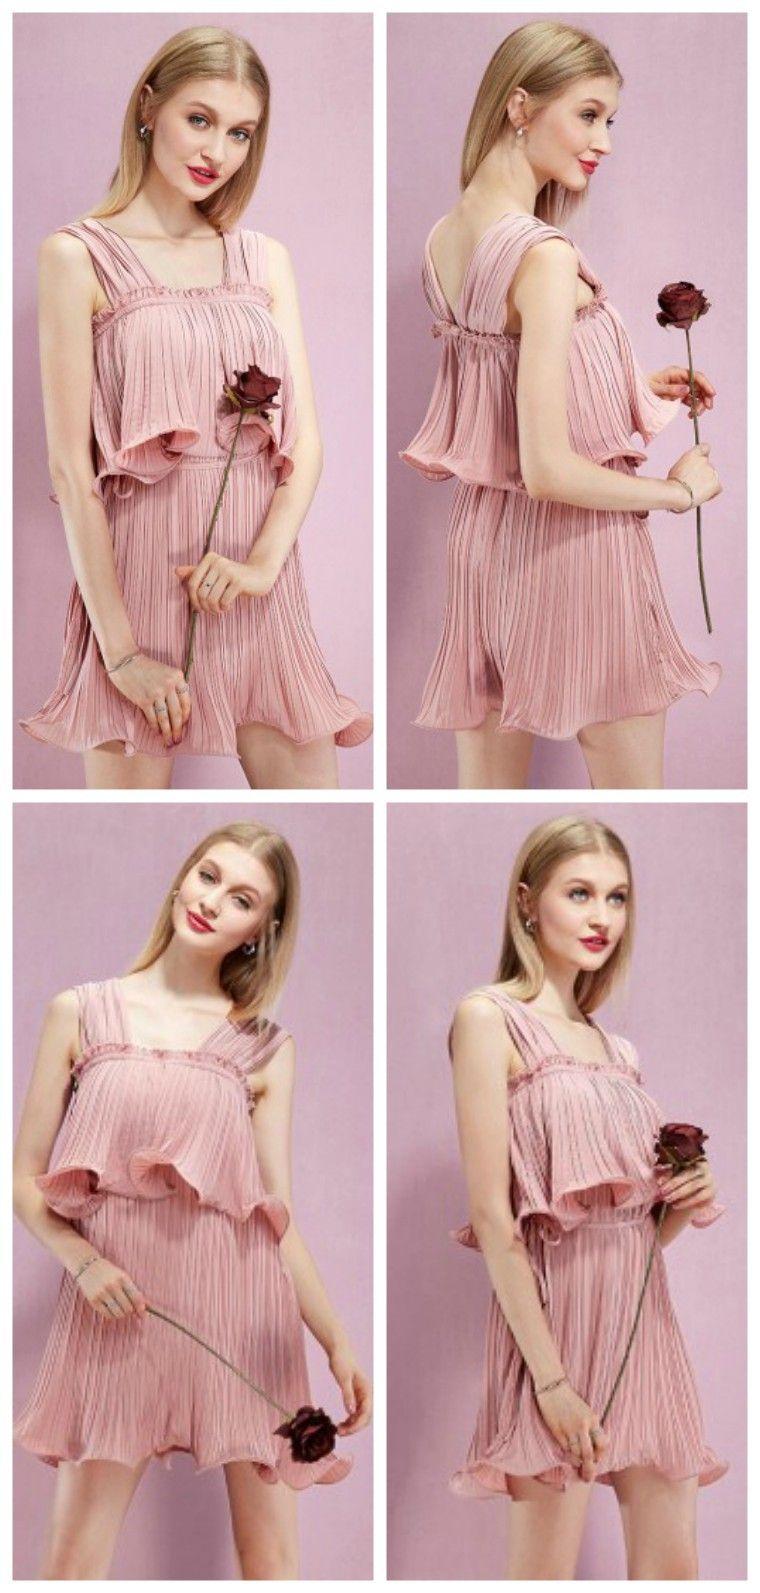 caa016074e New Trend for Bridesmaid Dress 2017 Spring Summer Wedding. Pink Pleated  Short Chiffon Dresses